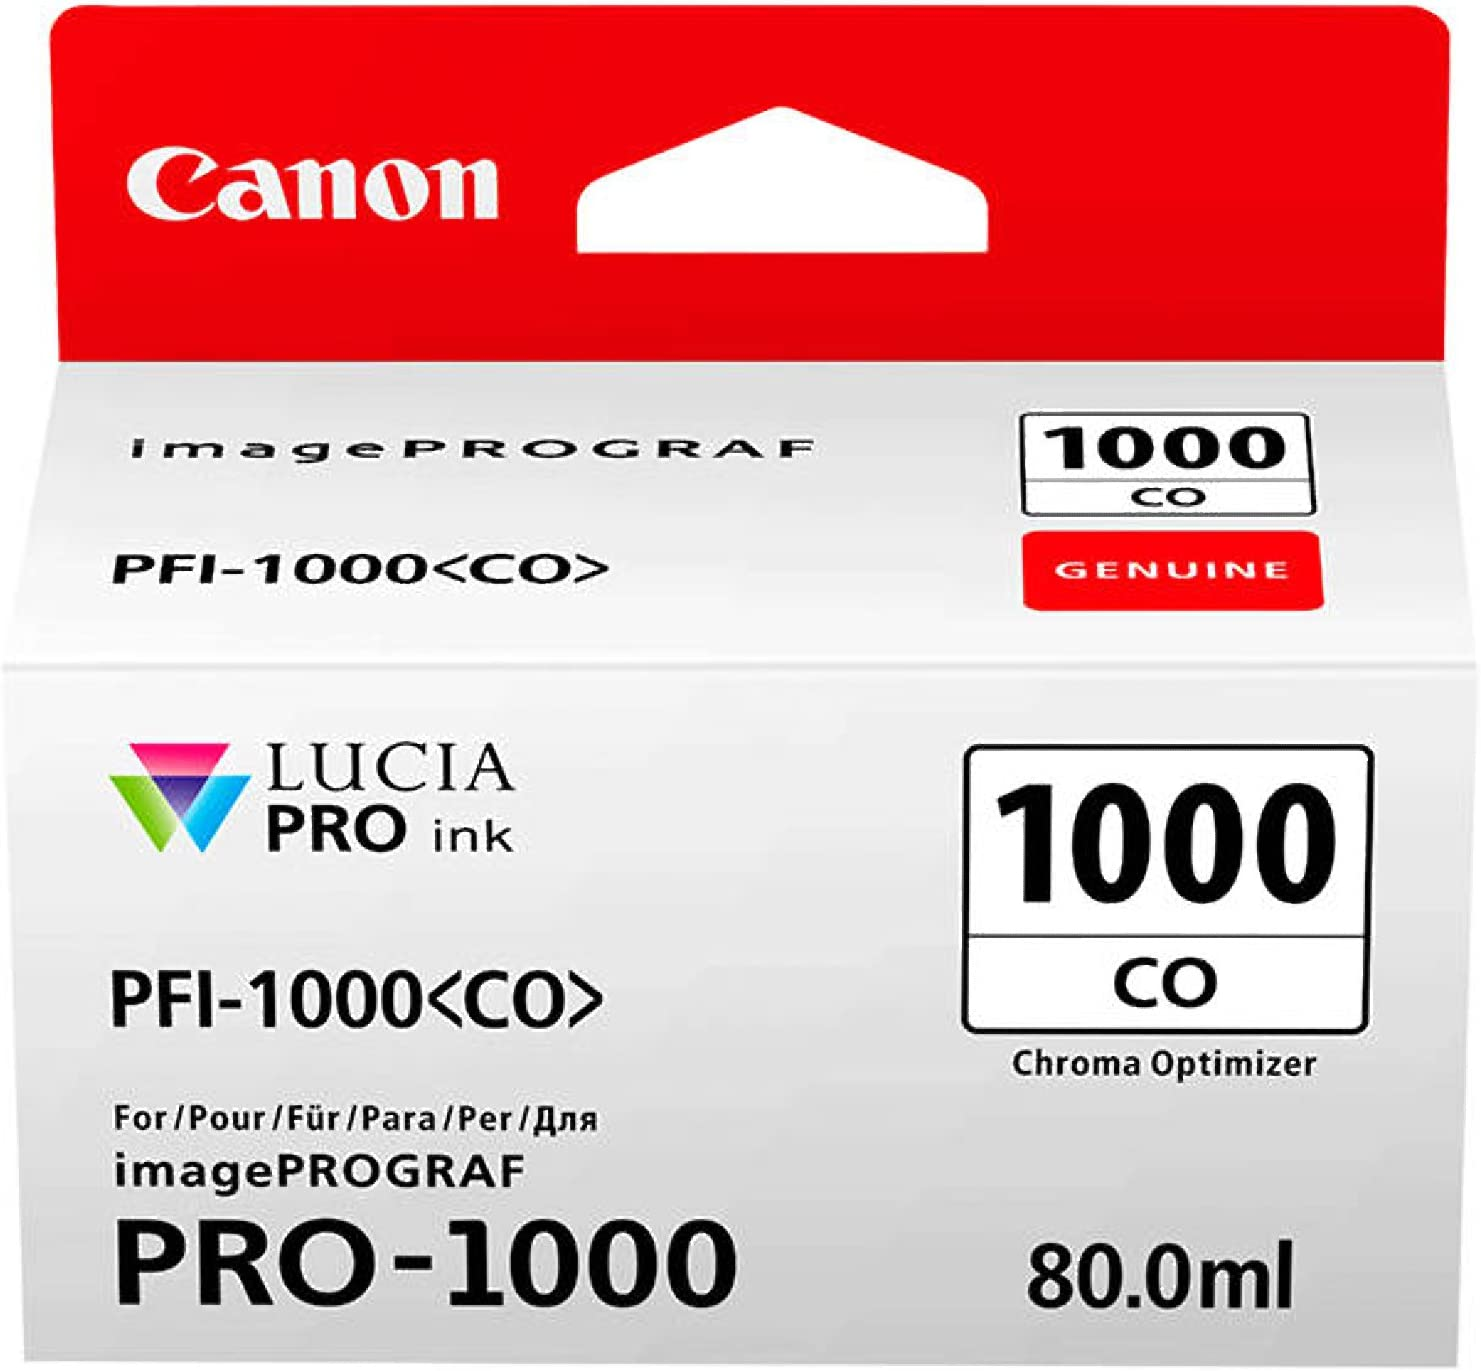 Canon Pfi-1000 Co Chroma optimizer ink ta